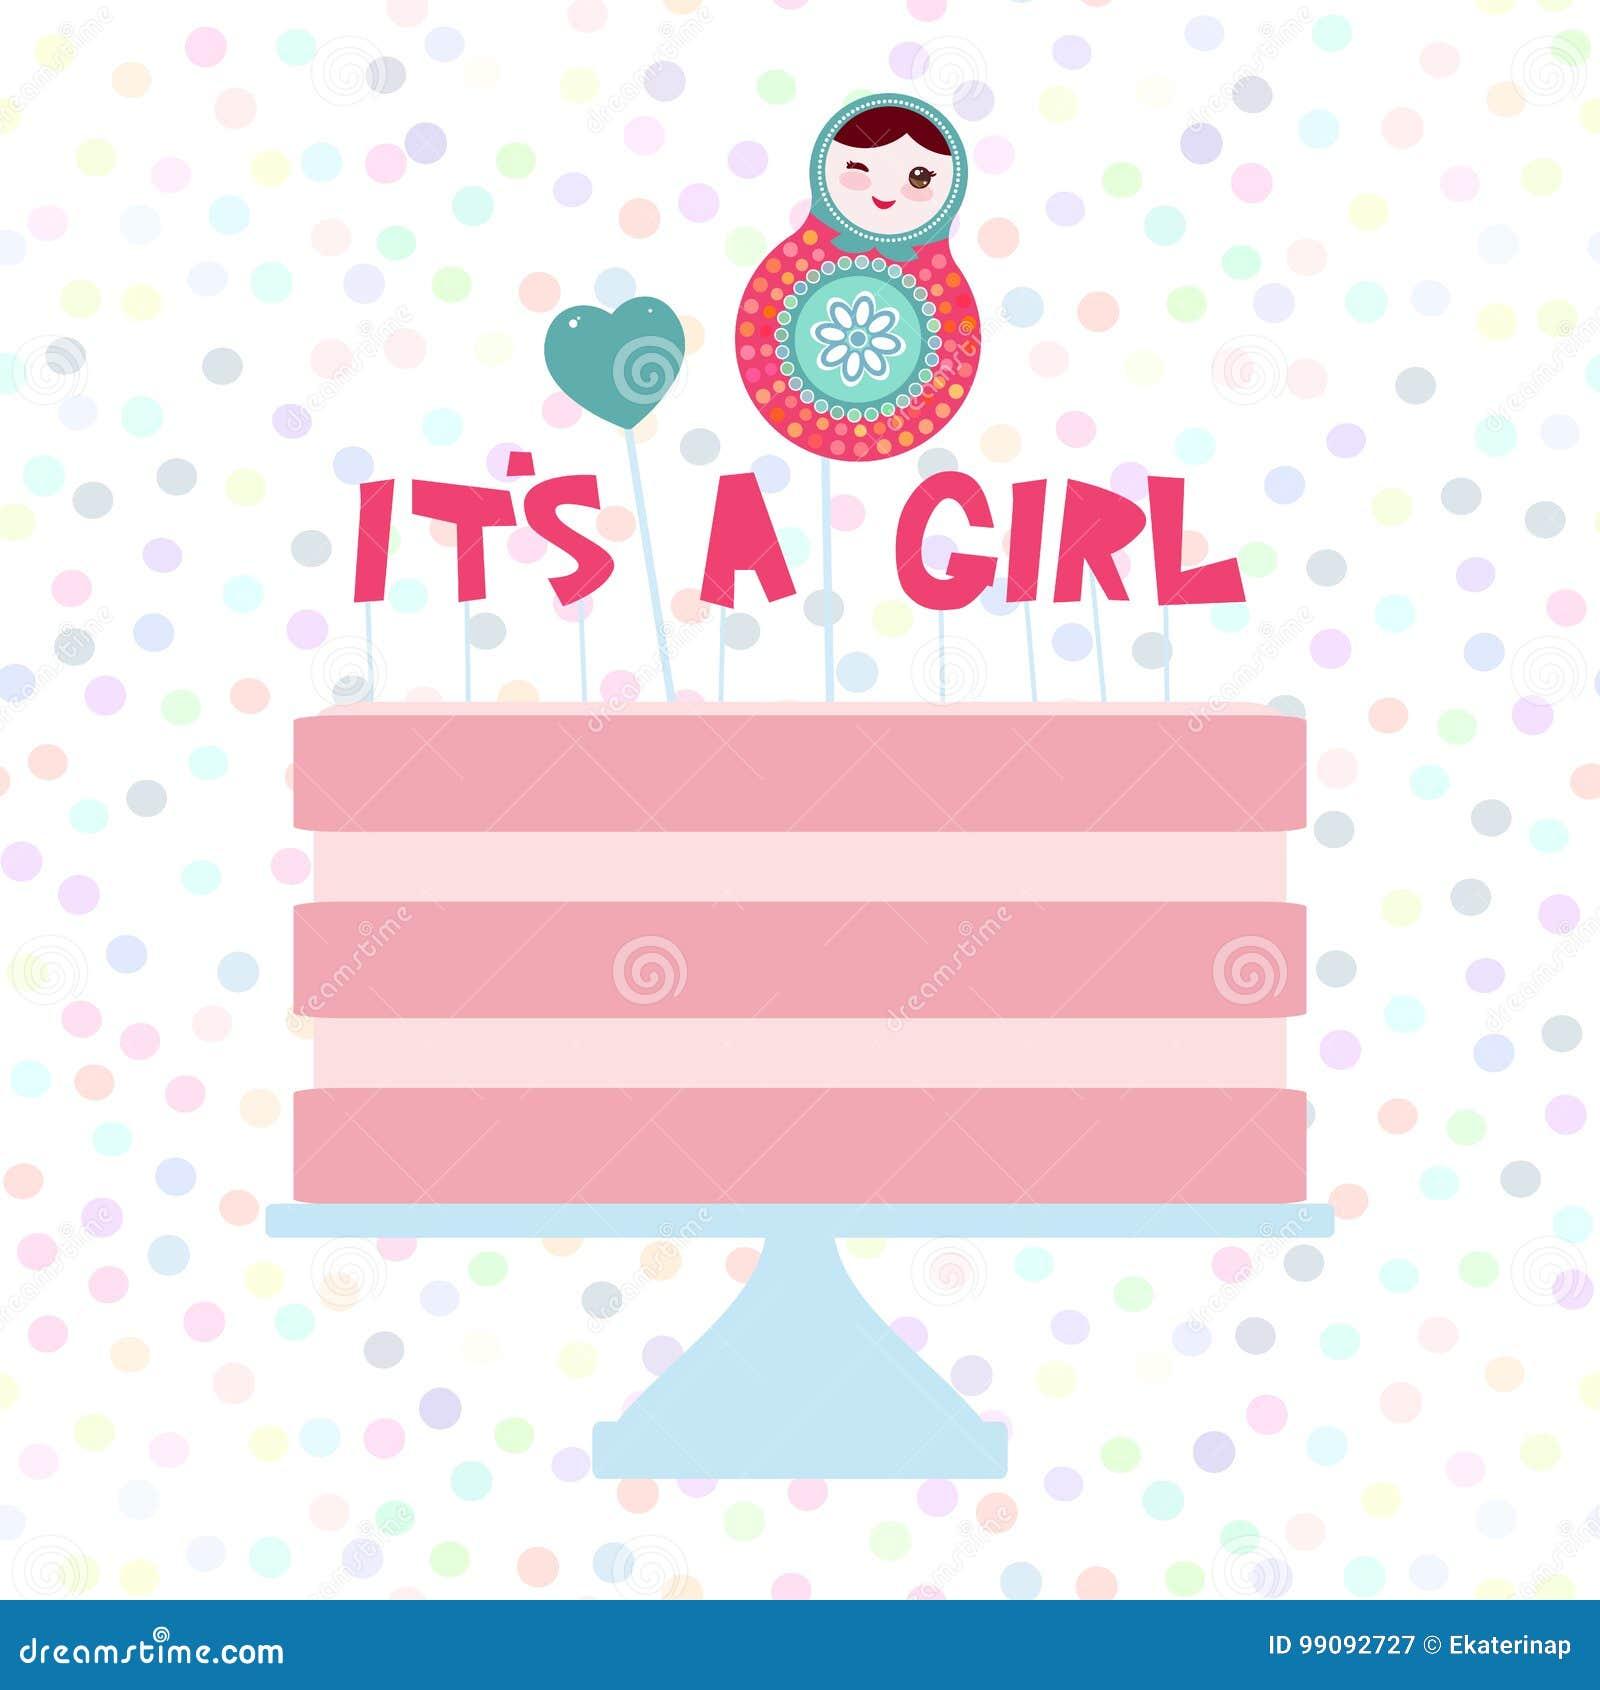 Its A Girl Sweet Pink Cake Strawberry Pink Cream Matryoshka